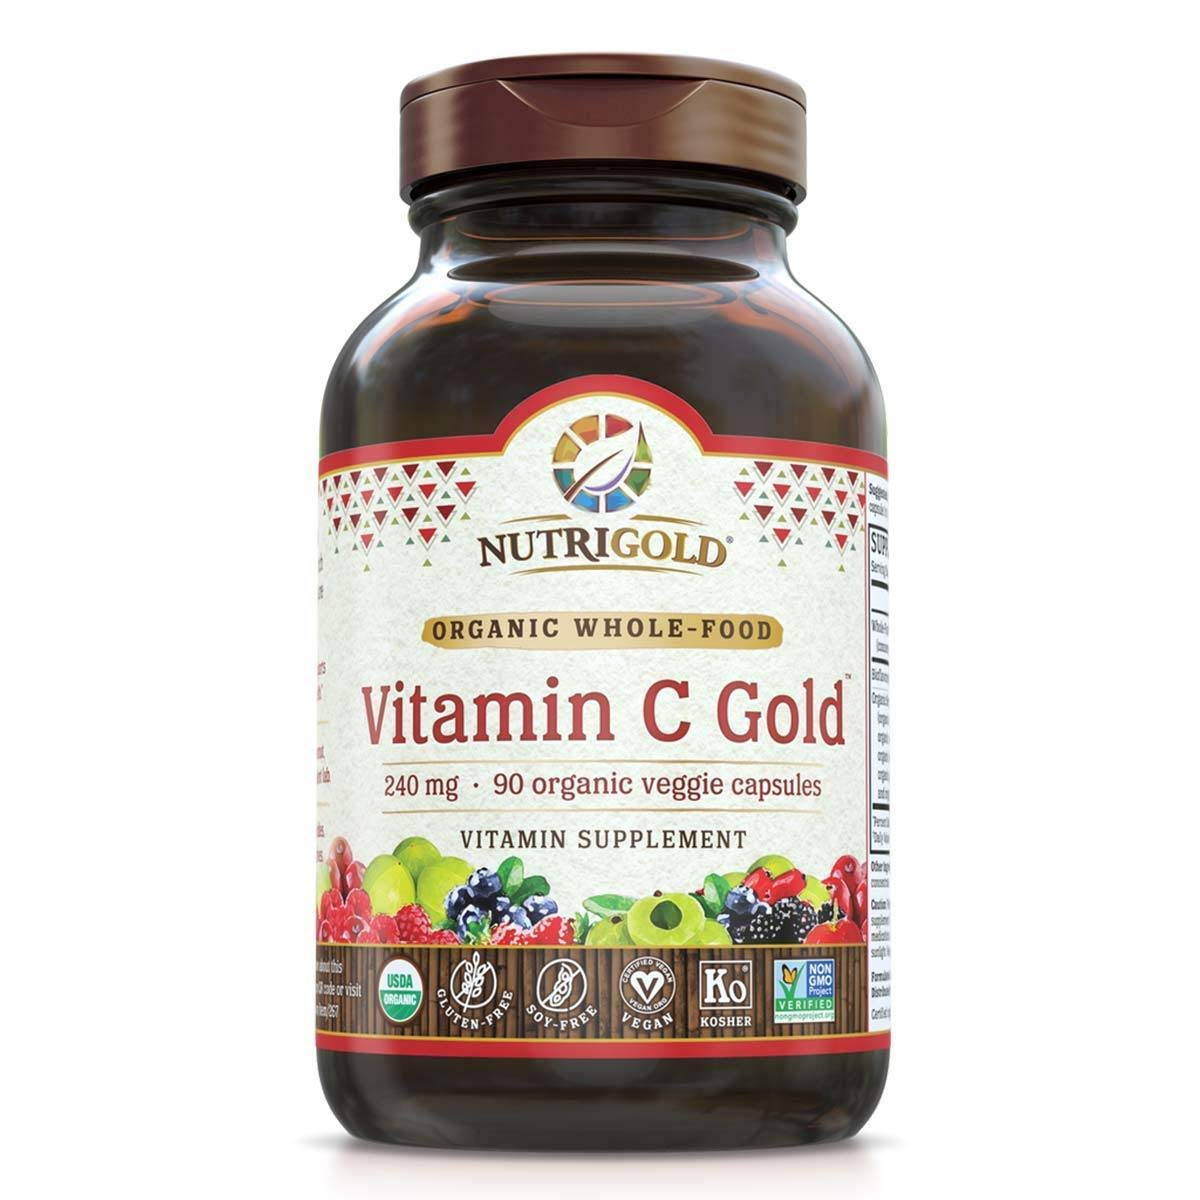 NutriGold Organic Whole-Food Vitamin C 240 mg 90 plantcaps